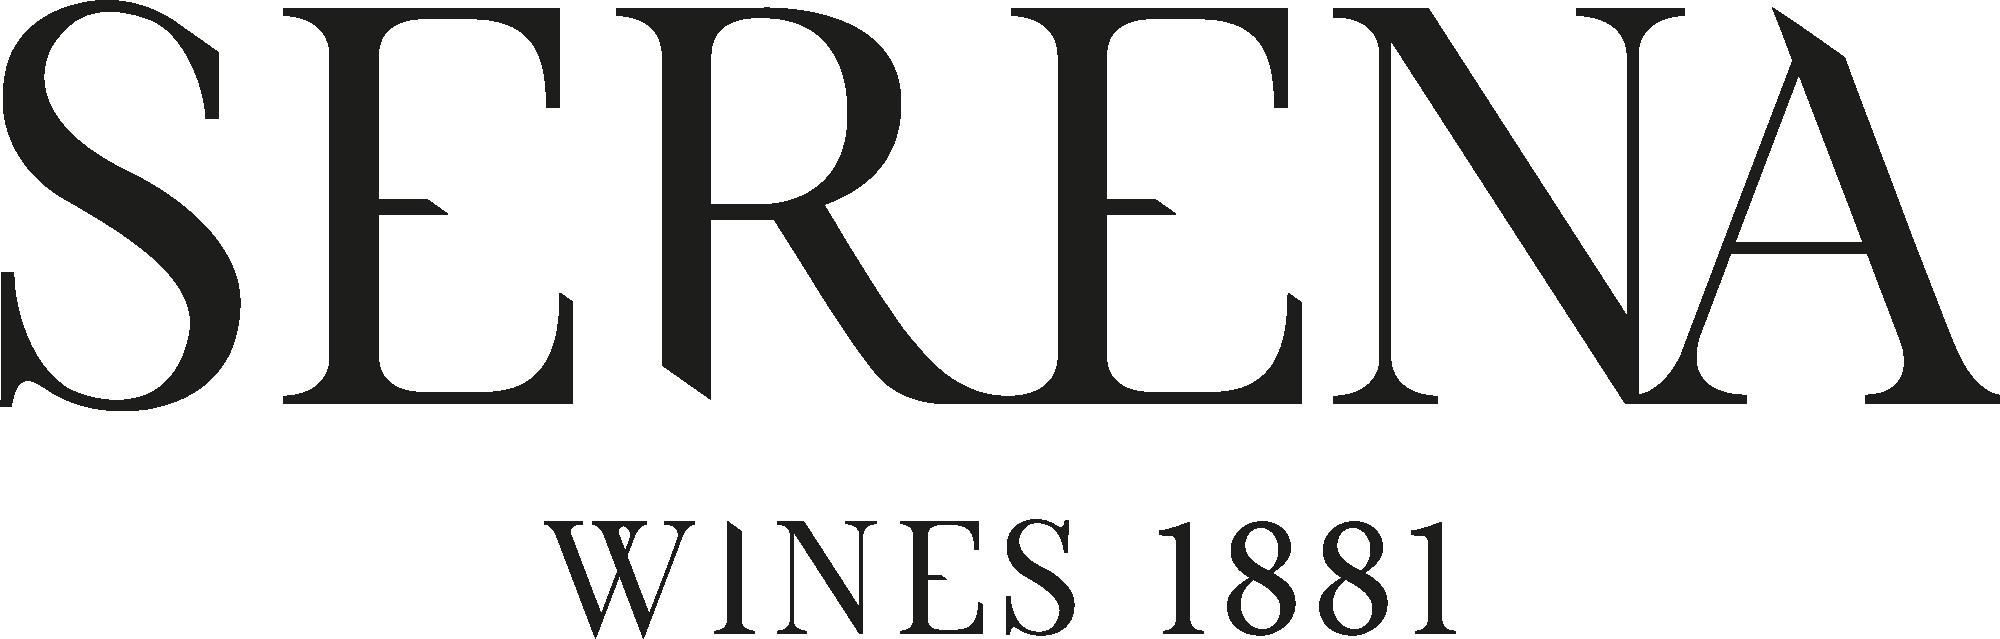 serena wines 1881 fucina culturale machiavelli verona sponsor